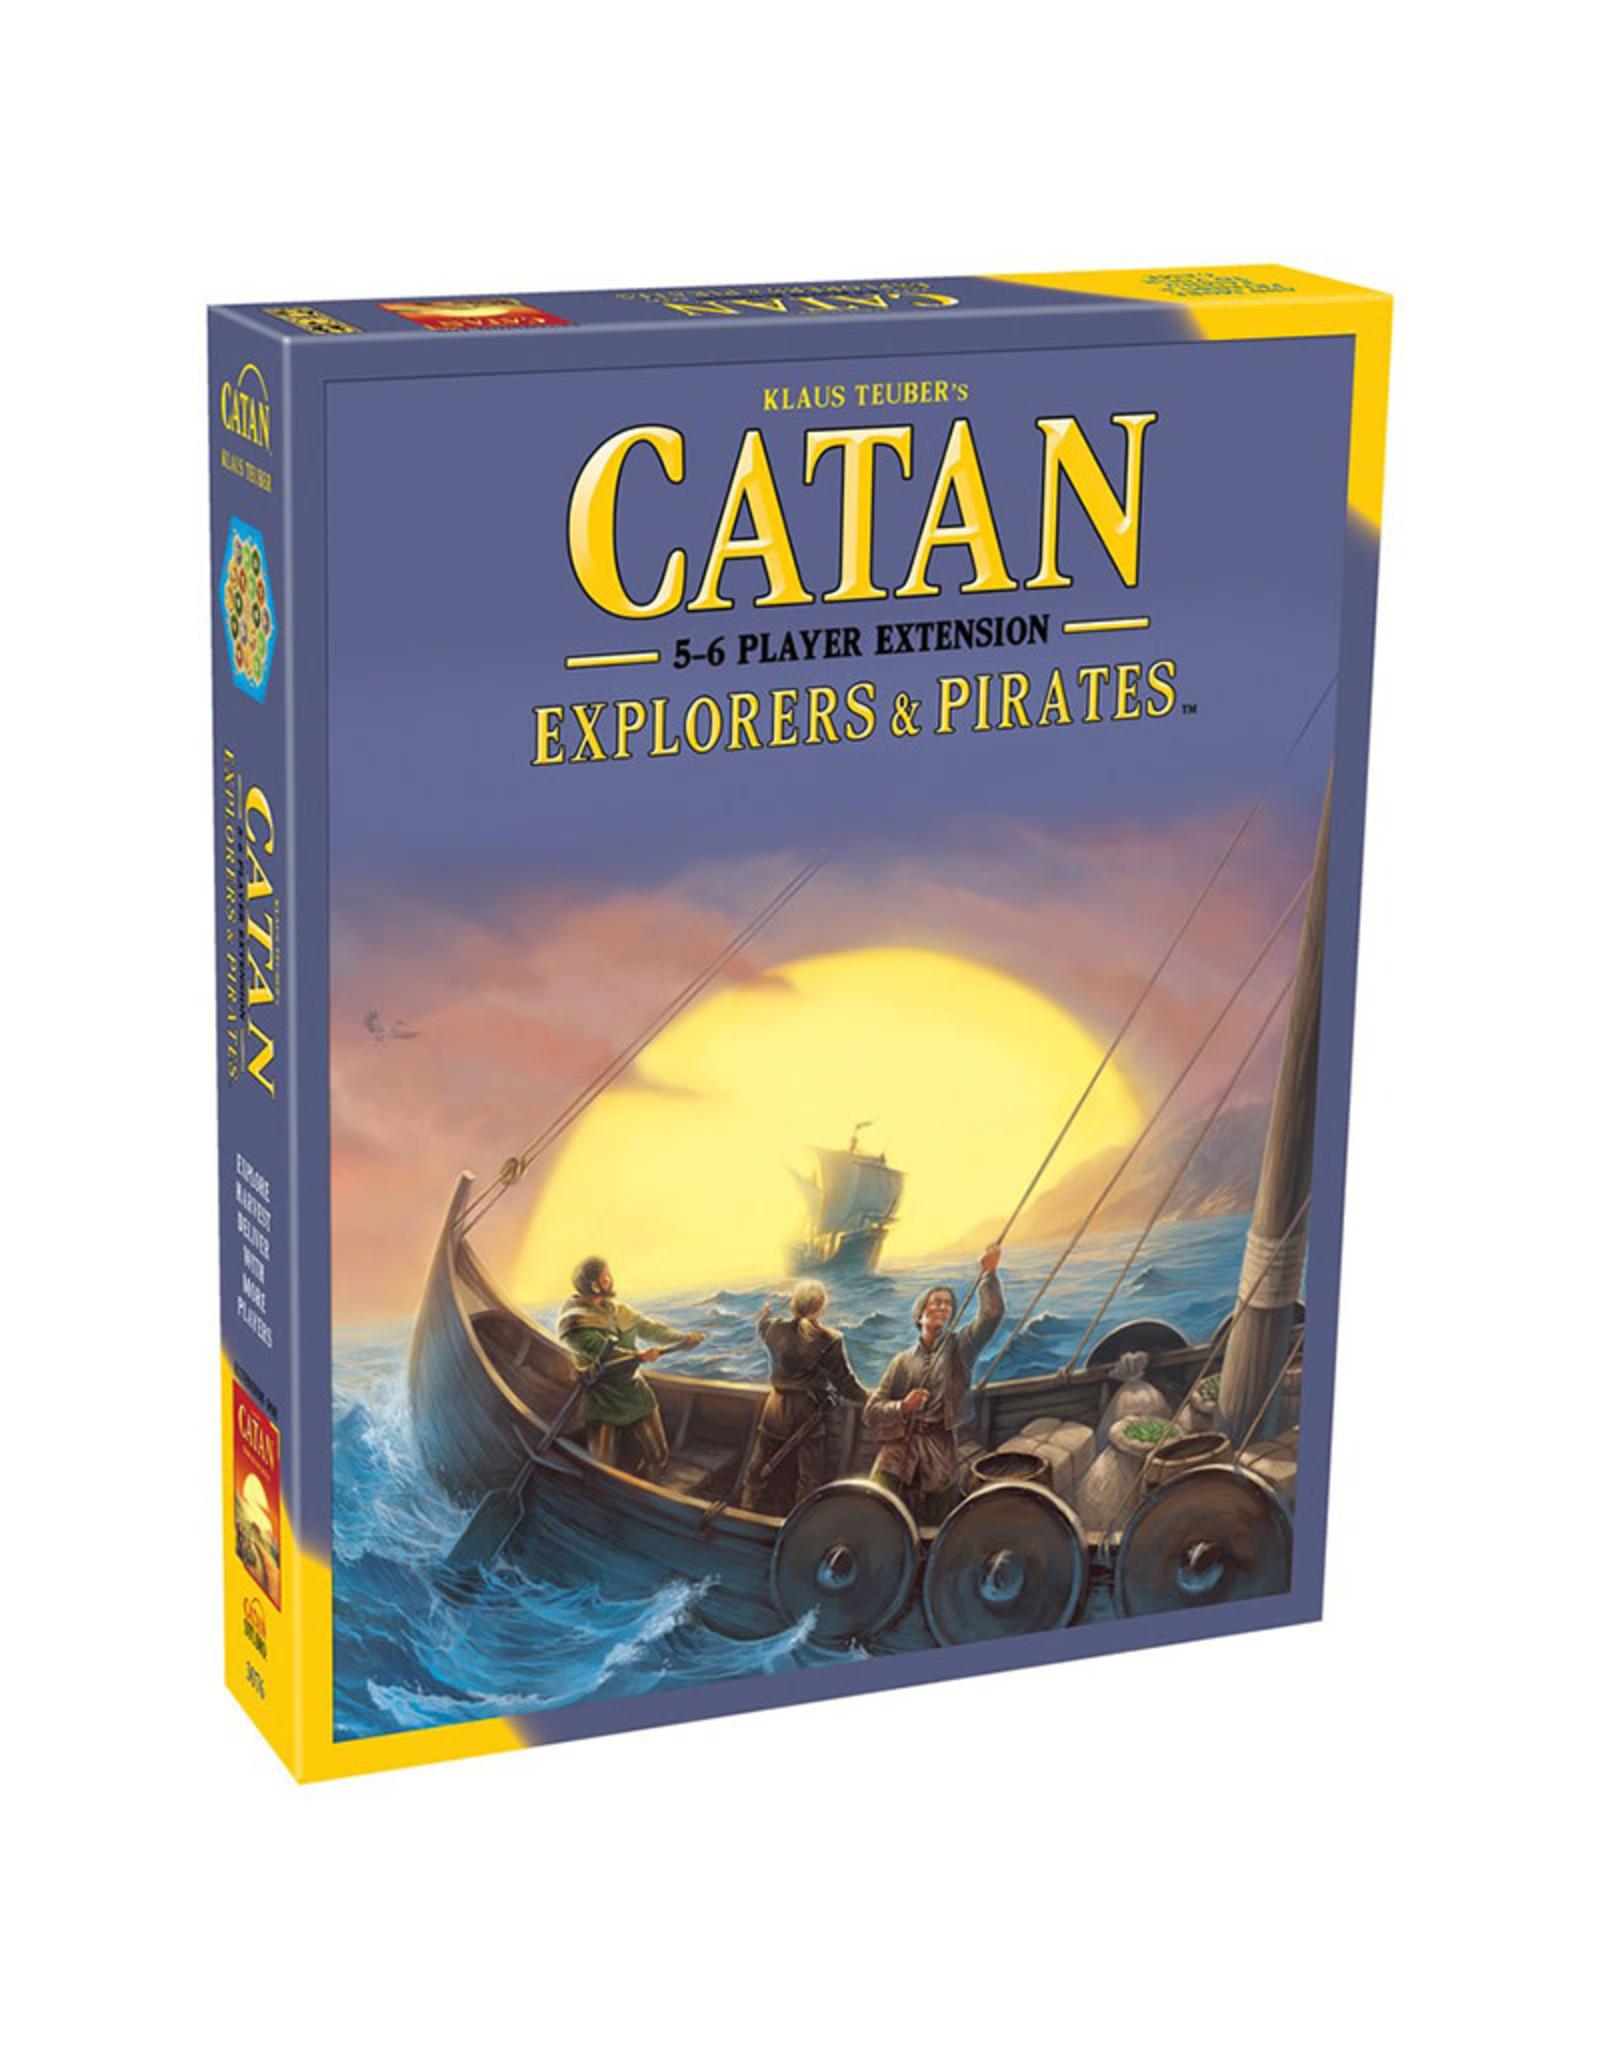 Catan Explorers & Pirates 5 - 6 Player Extension